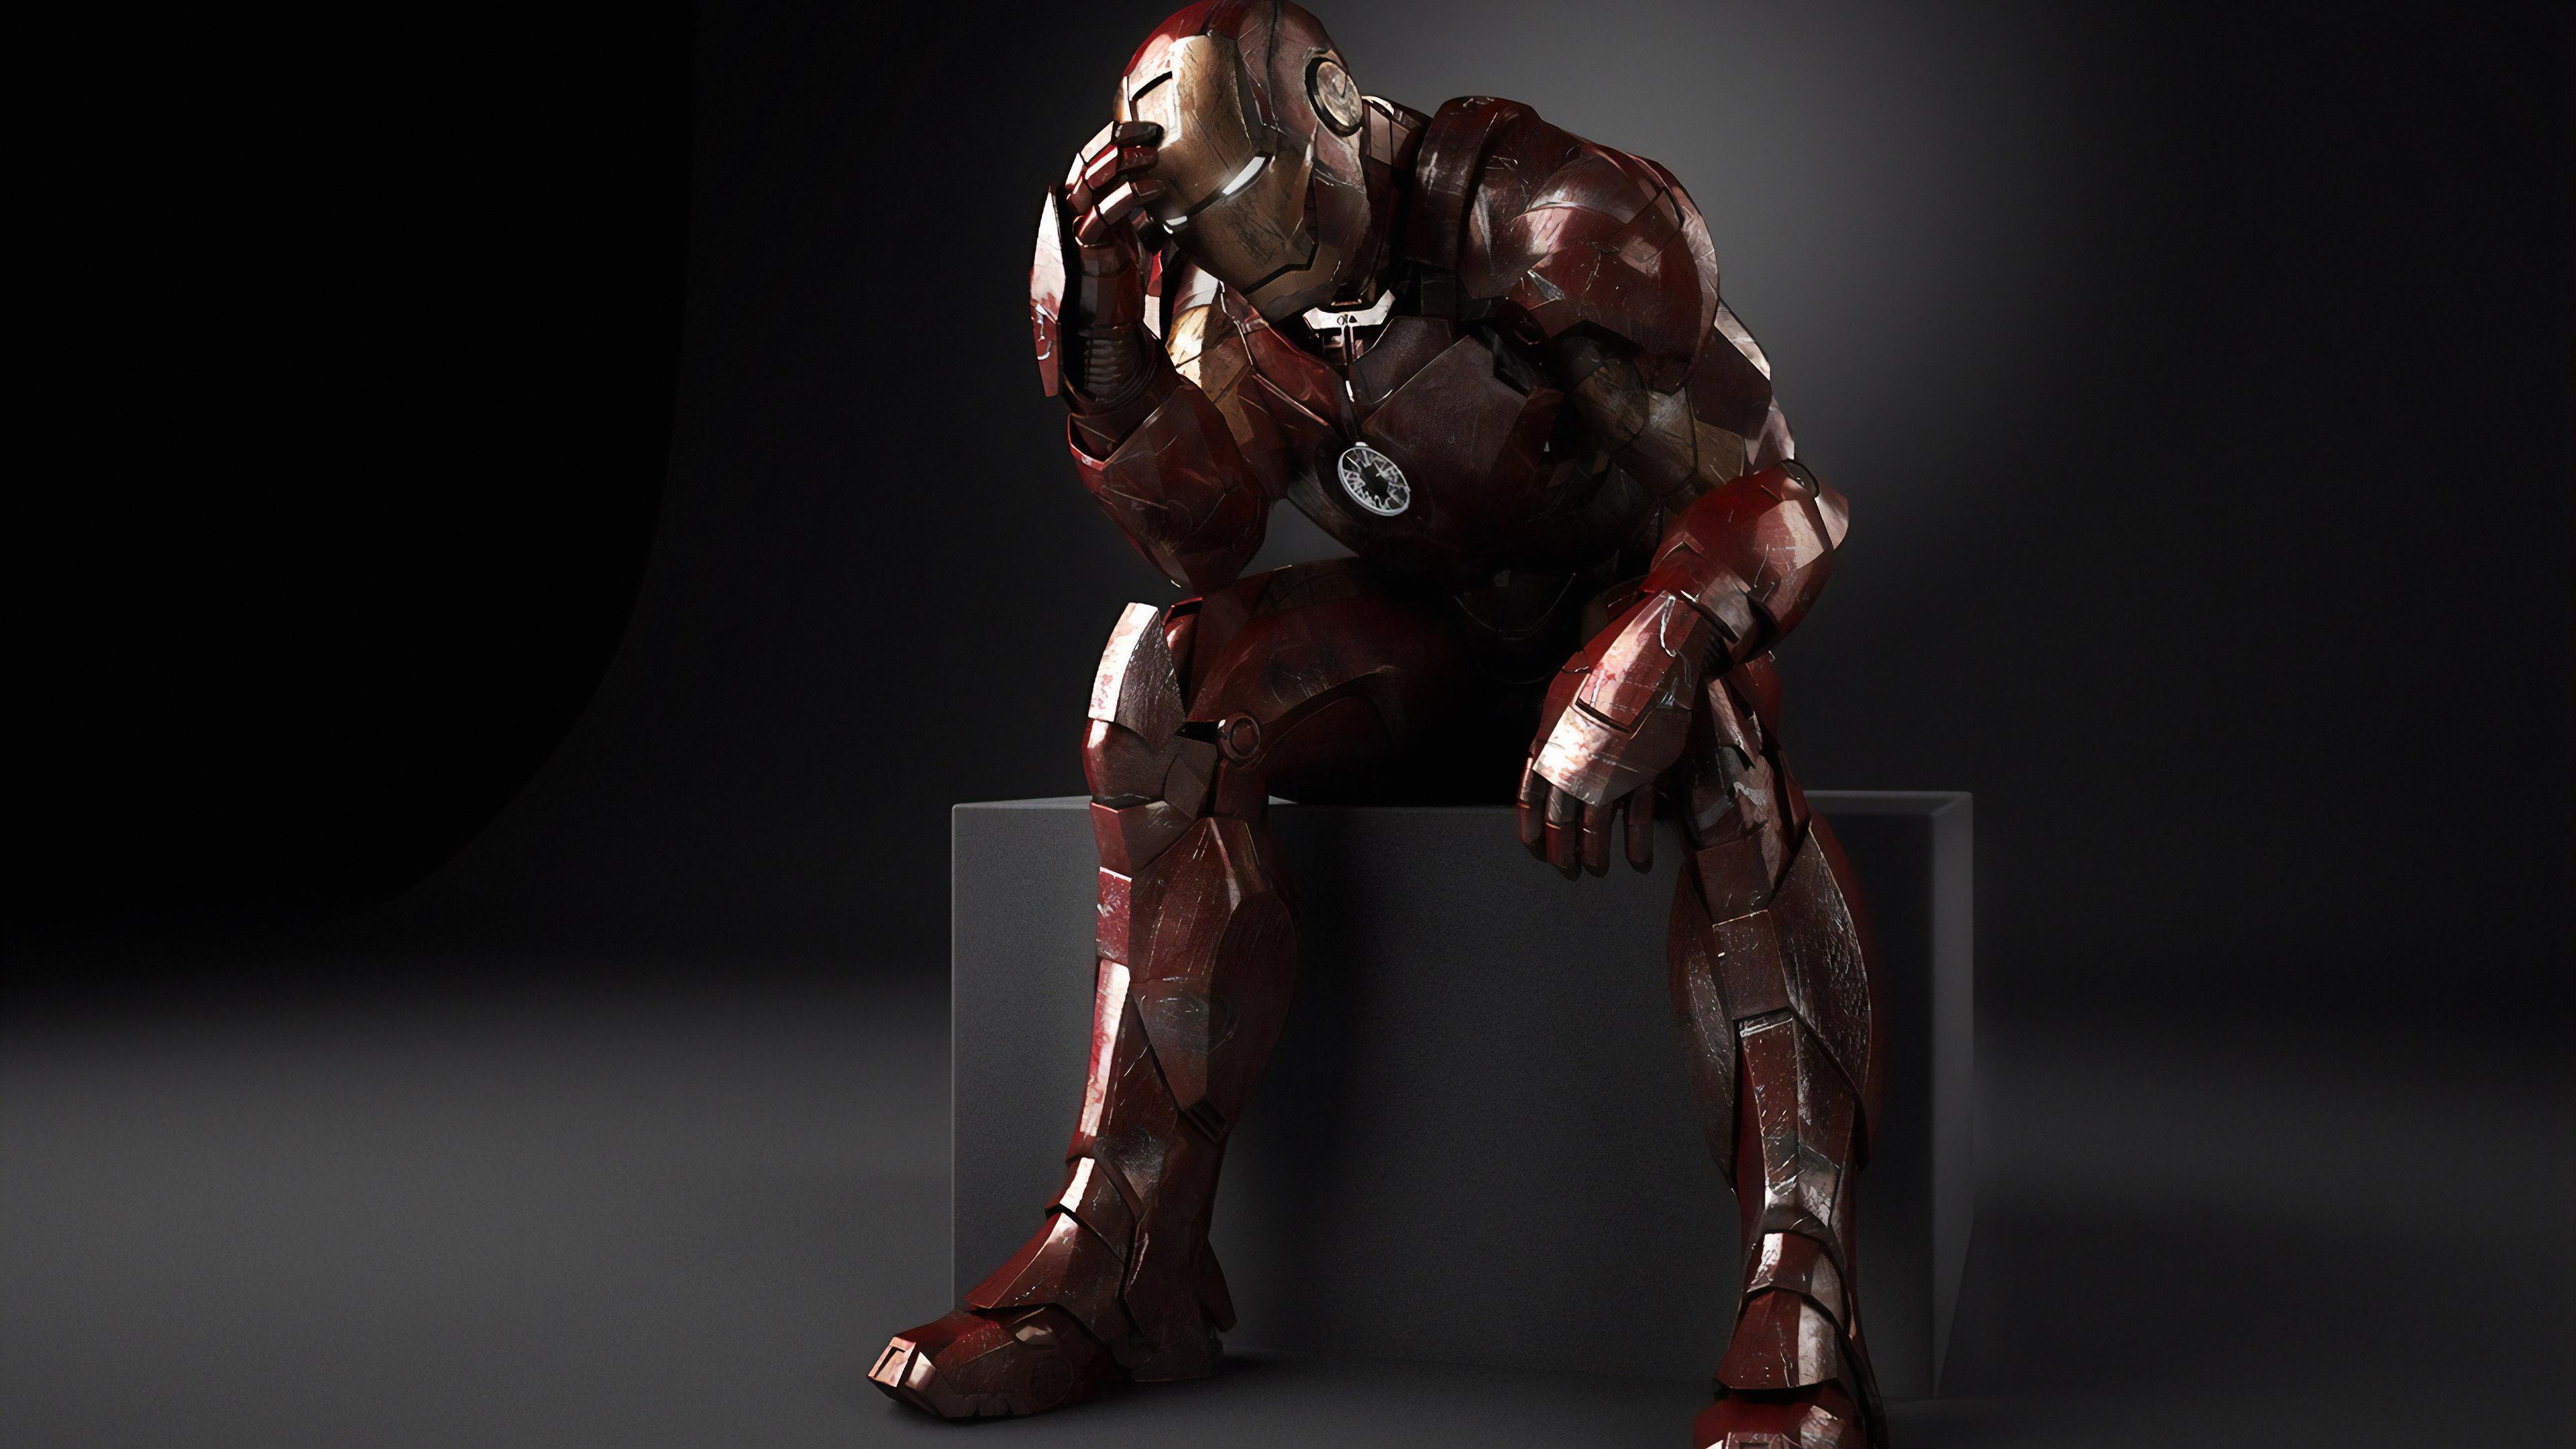 iron man thinking 1570394573 - Iron Man Thinking - superheroes wallpapers, iron man wallpapers, hd-wallpapers, digital art wallpapers, behance wallpapers, artwork wallpapers, 4k-wallpapers